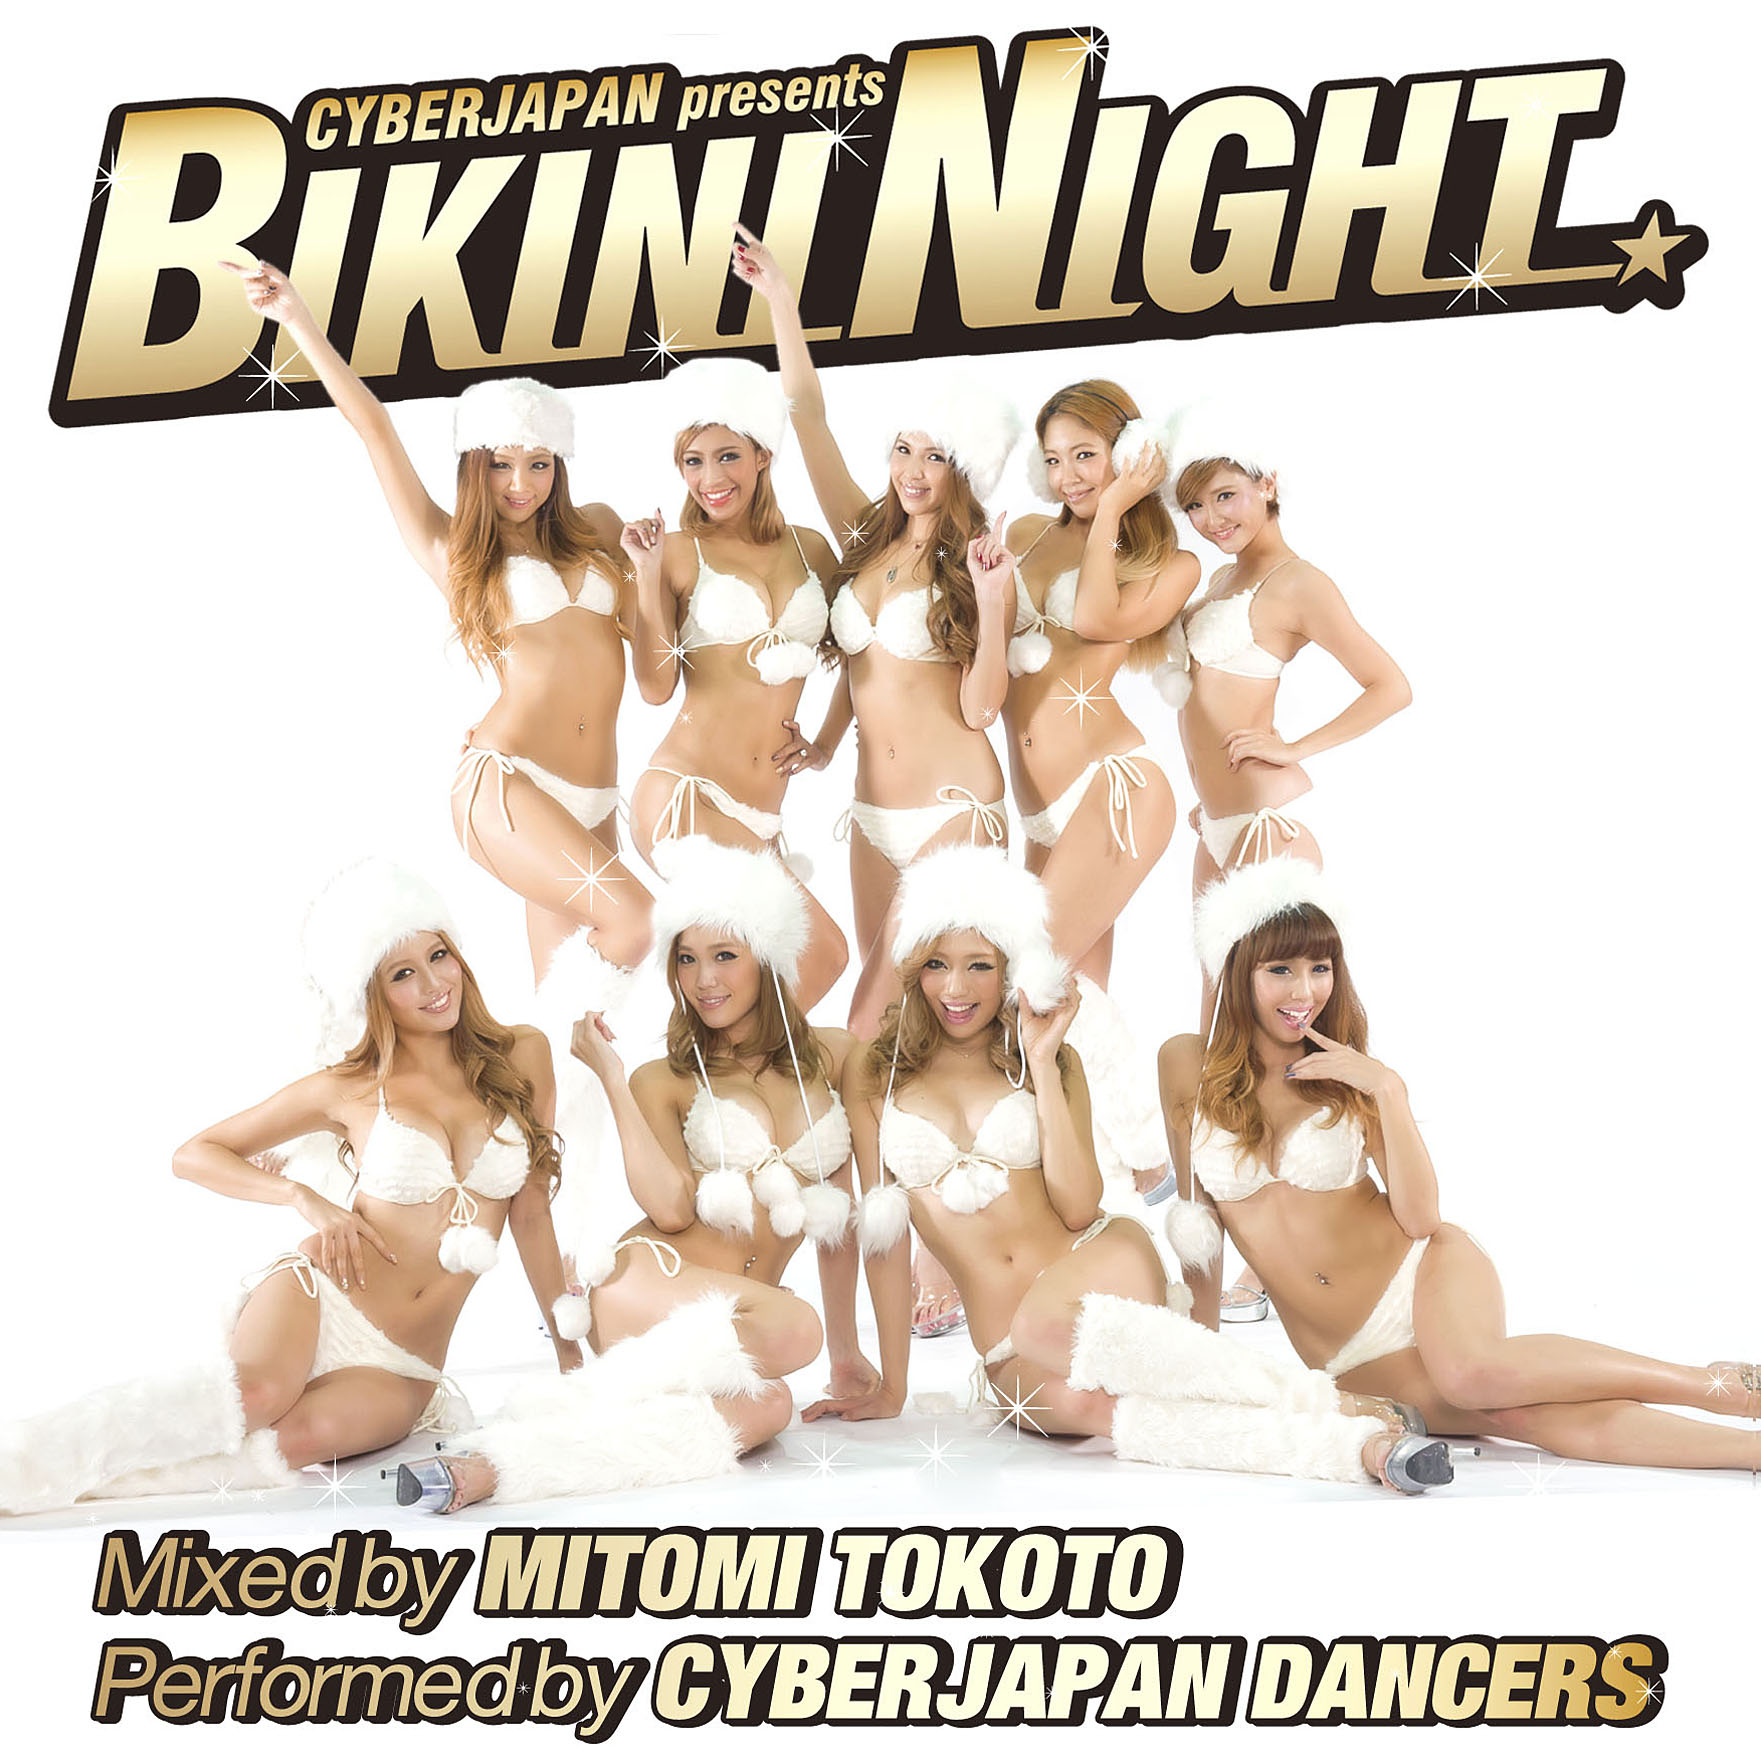 MITOMI TOKOTO&CYBERJAPAN DANCERS_CYBERJAPAN presents BIKINI NIGHT